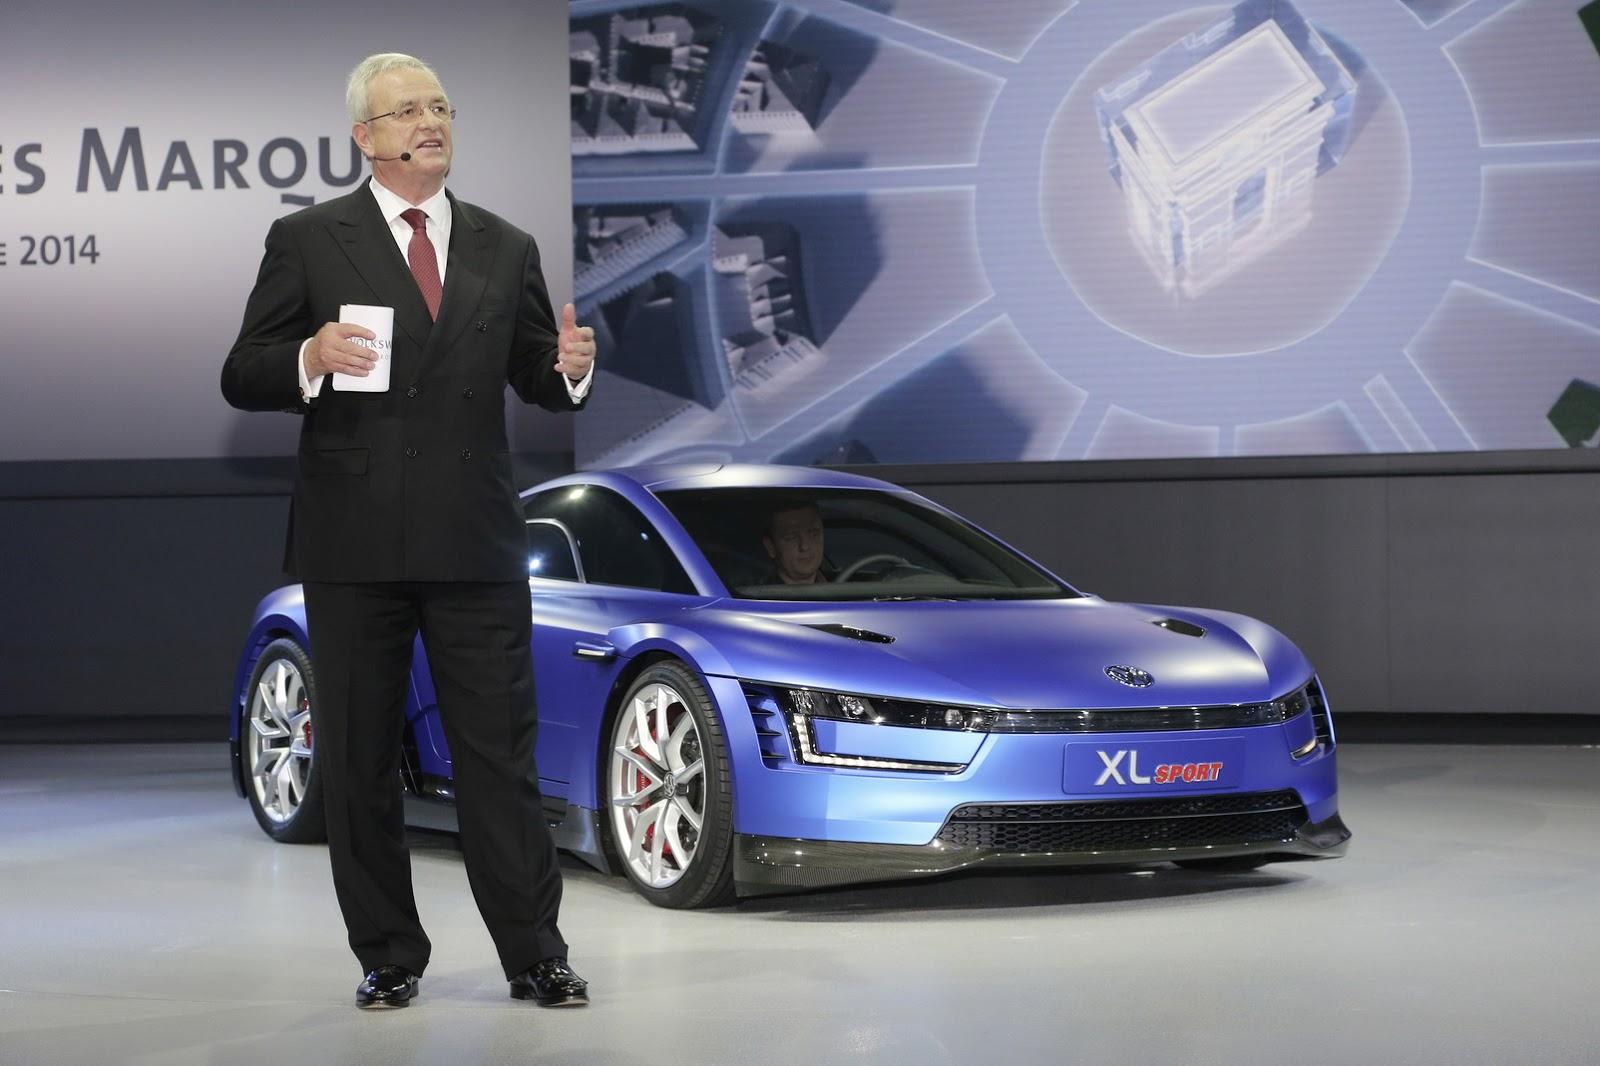 Volkswagen XL Sport Concept tại triển lãm xe hơi Paris 2014